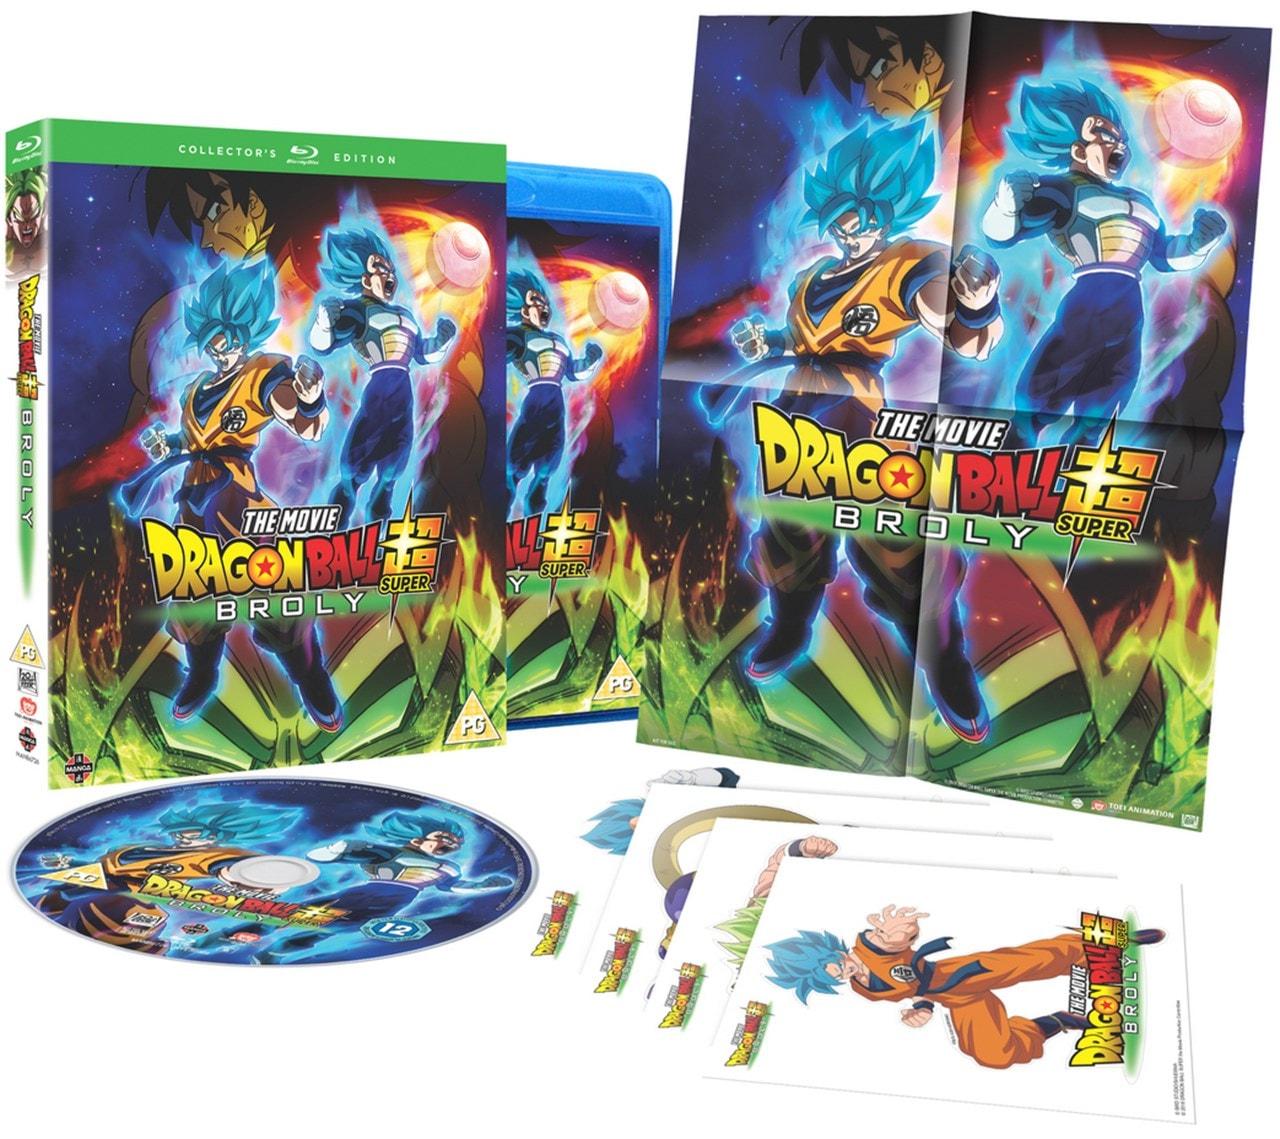 Dragon Ball Super: Broly - 3